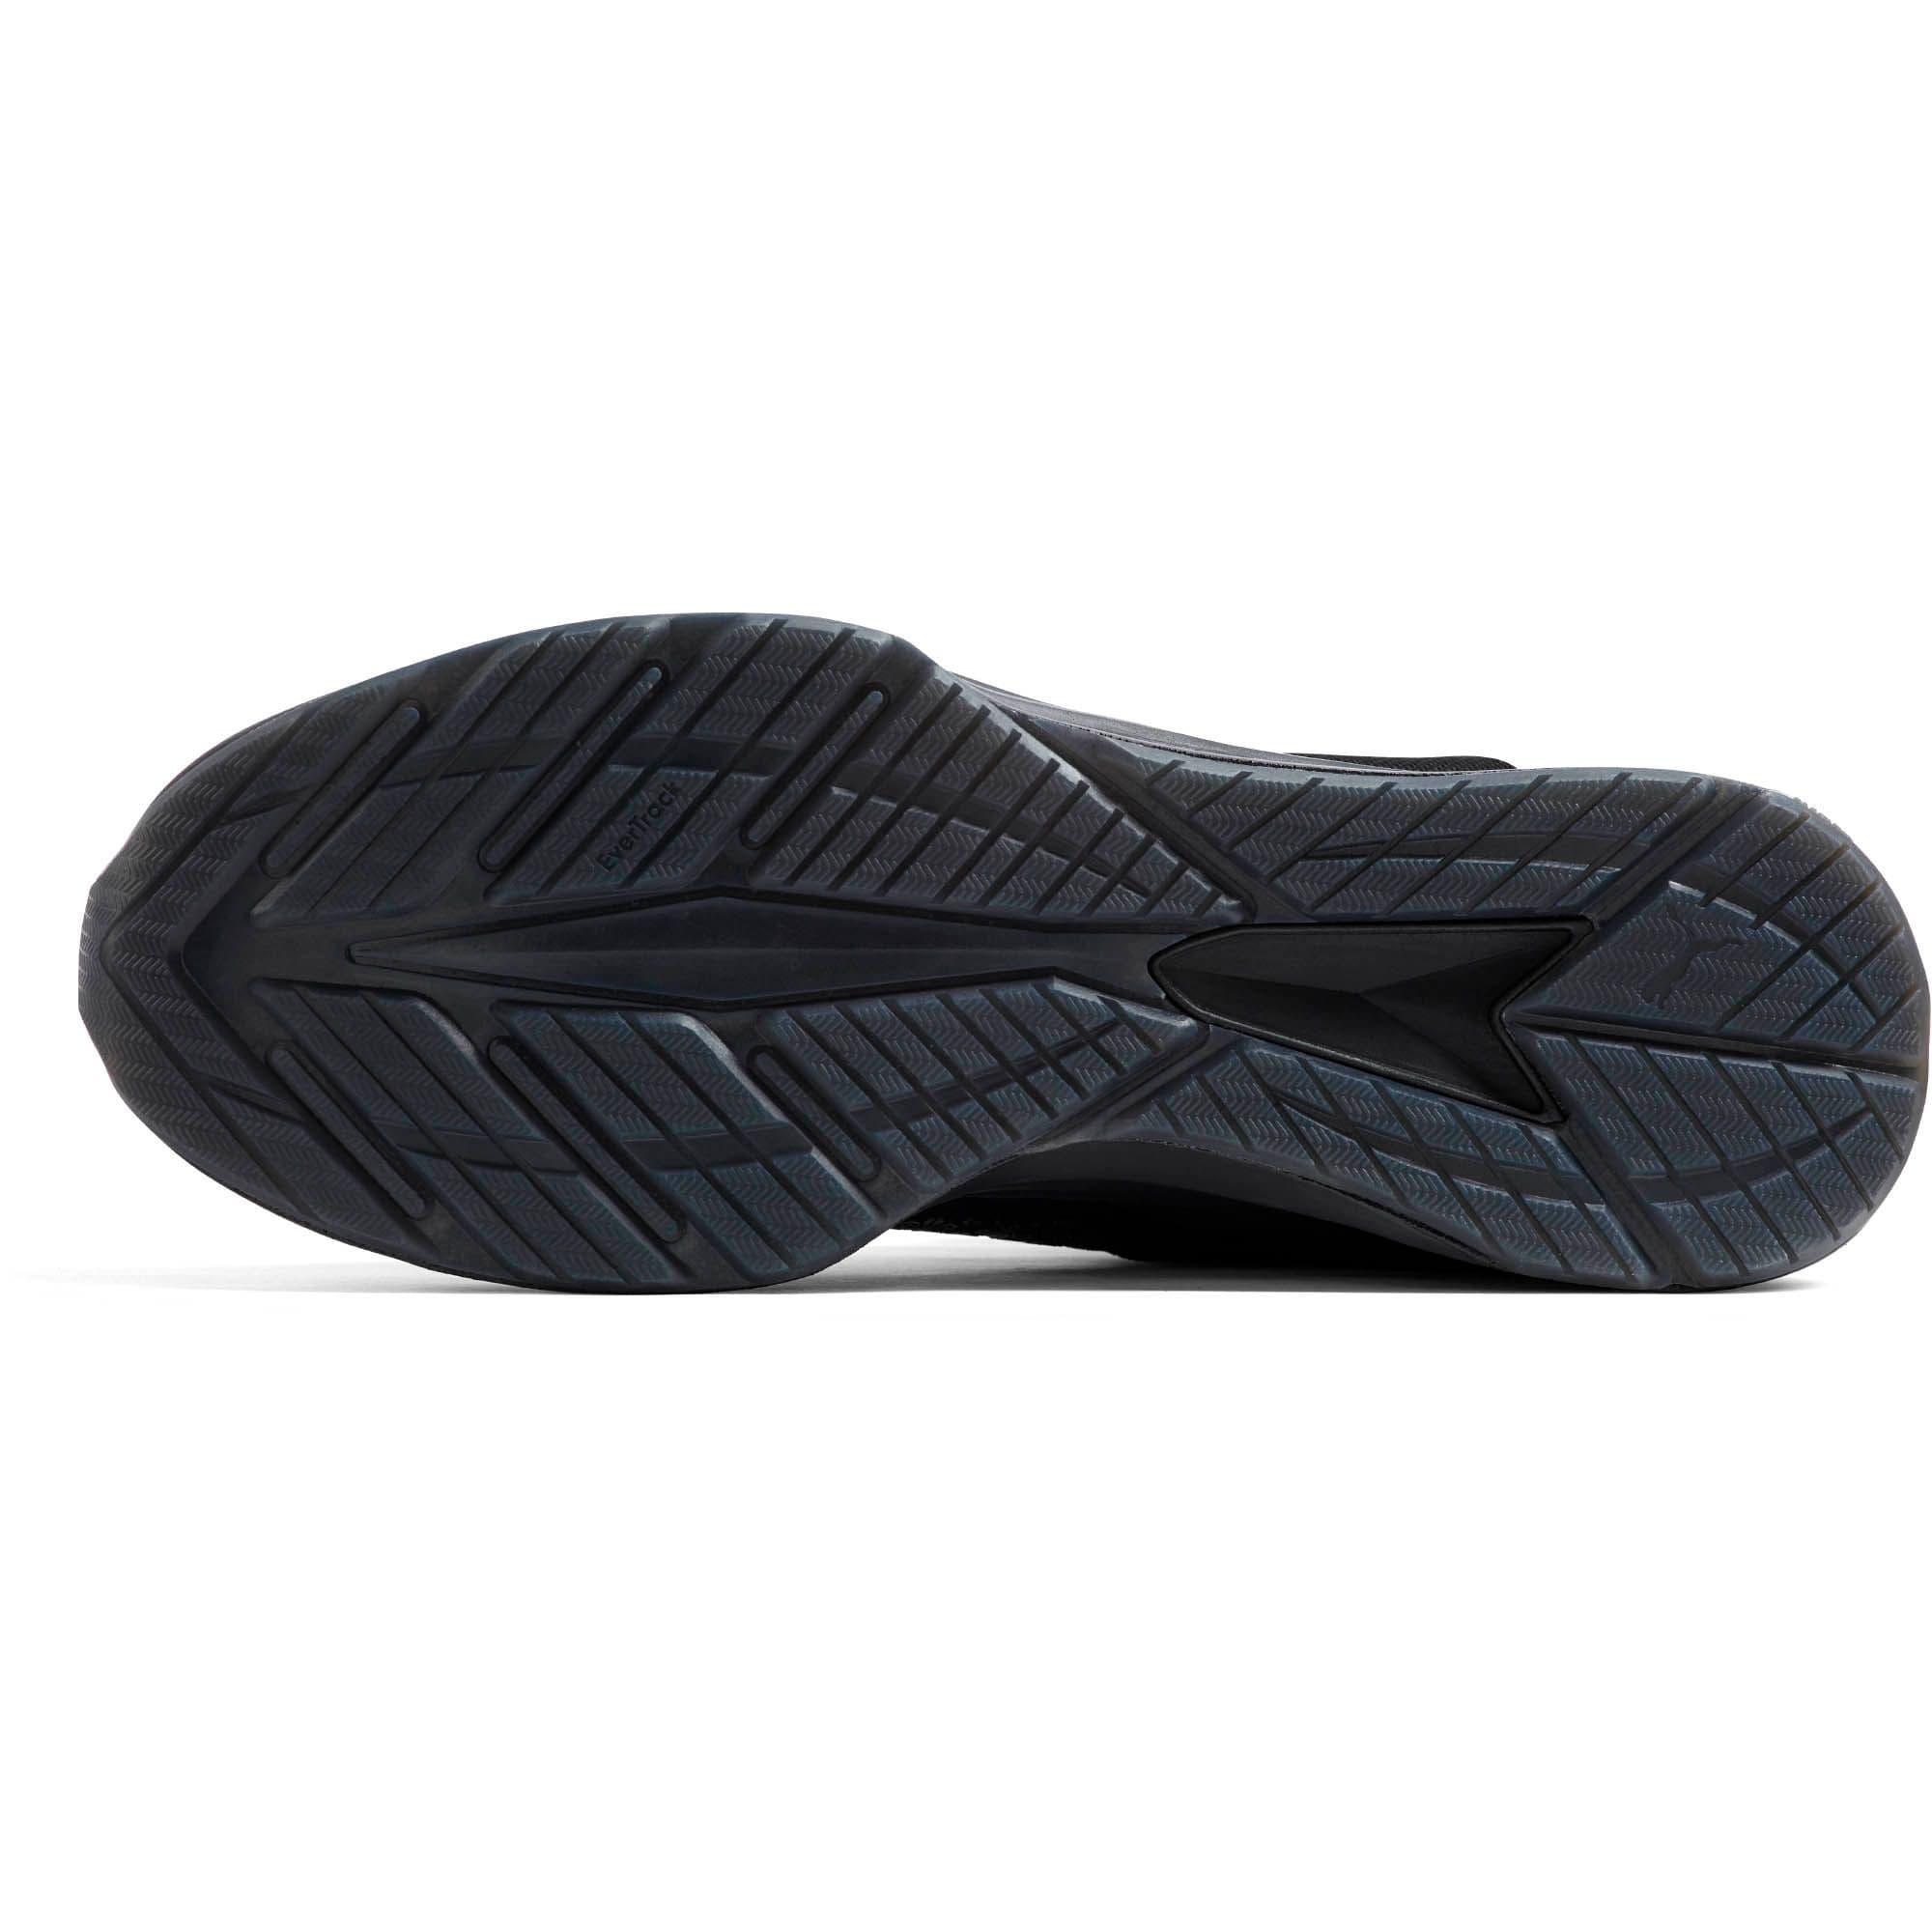 Thumbnail 3 of IGNITE evoKNIT En Noir Men's Training Shoes, Puma Black-Puma Black, medium